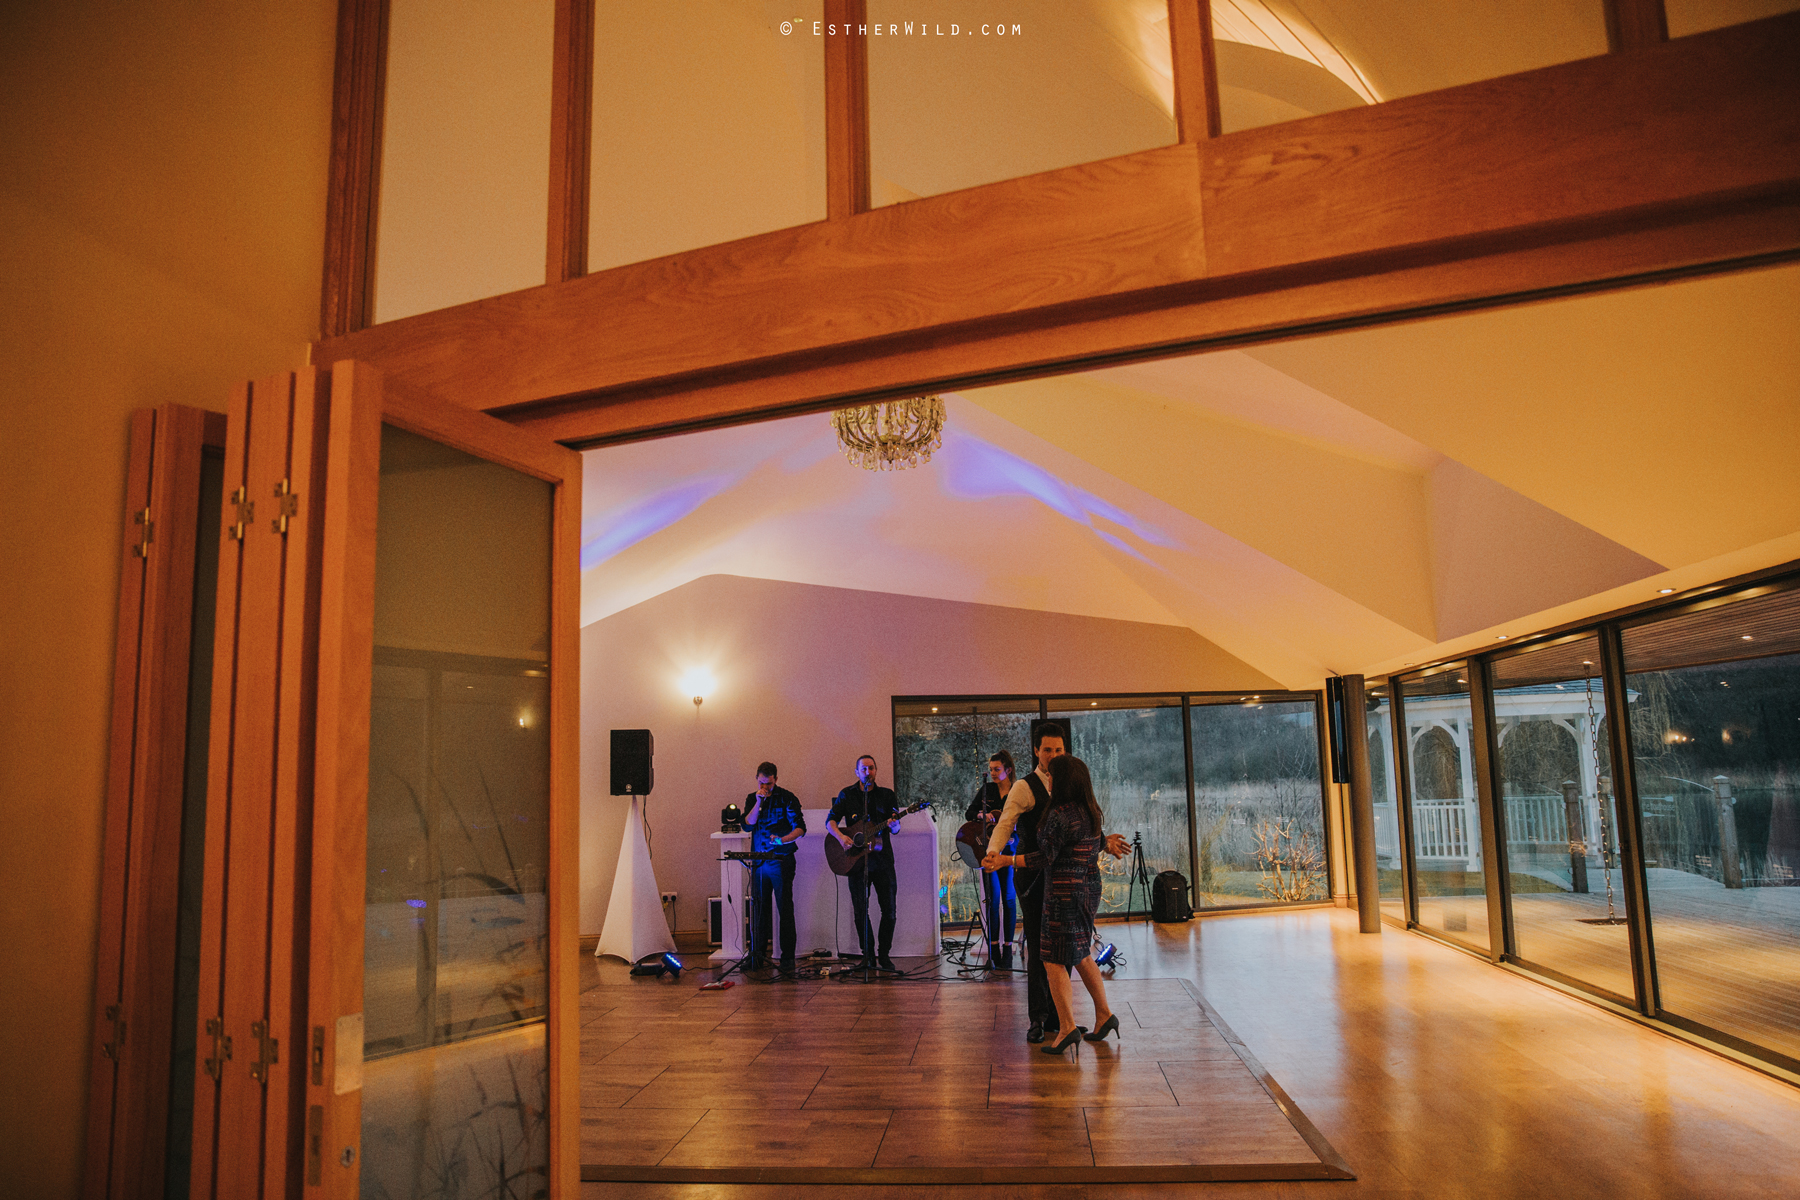 The_BoatHouse_Wedding_Venue_Ormesby_Norfolk_Broads_Boat_Wedding_Photography_Esther_Wild_Photographer_IMG_3357.jpg